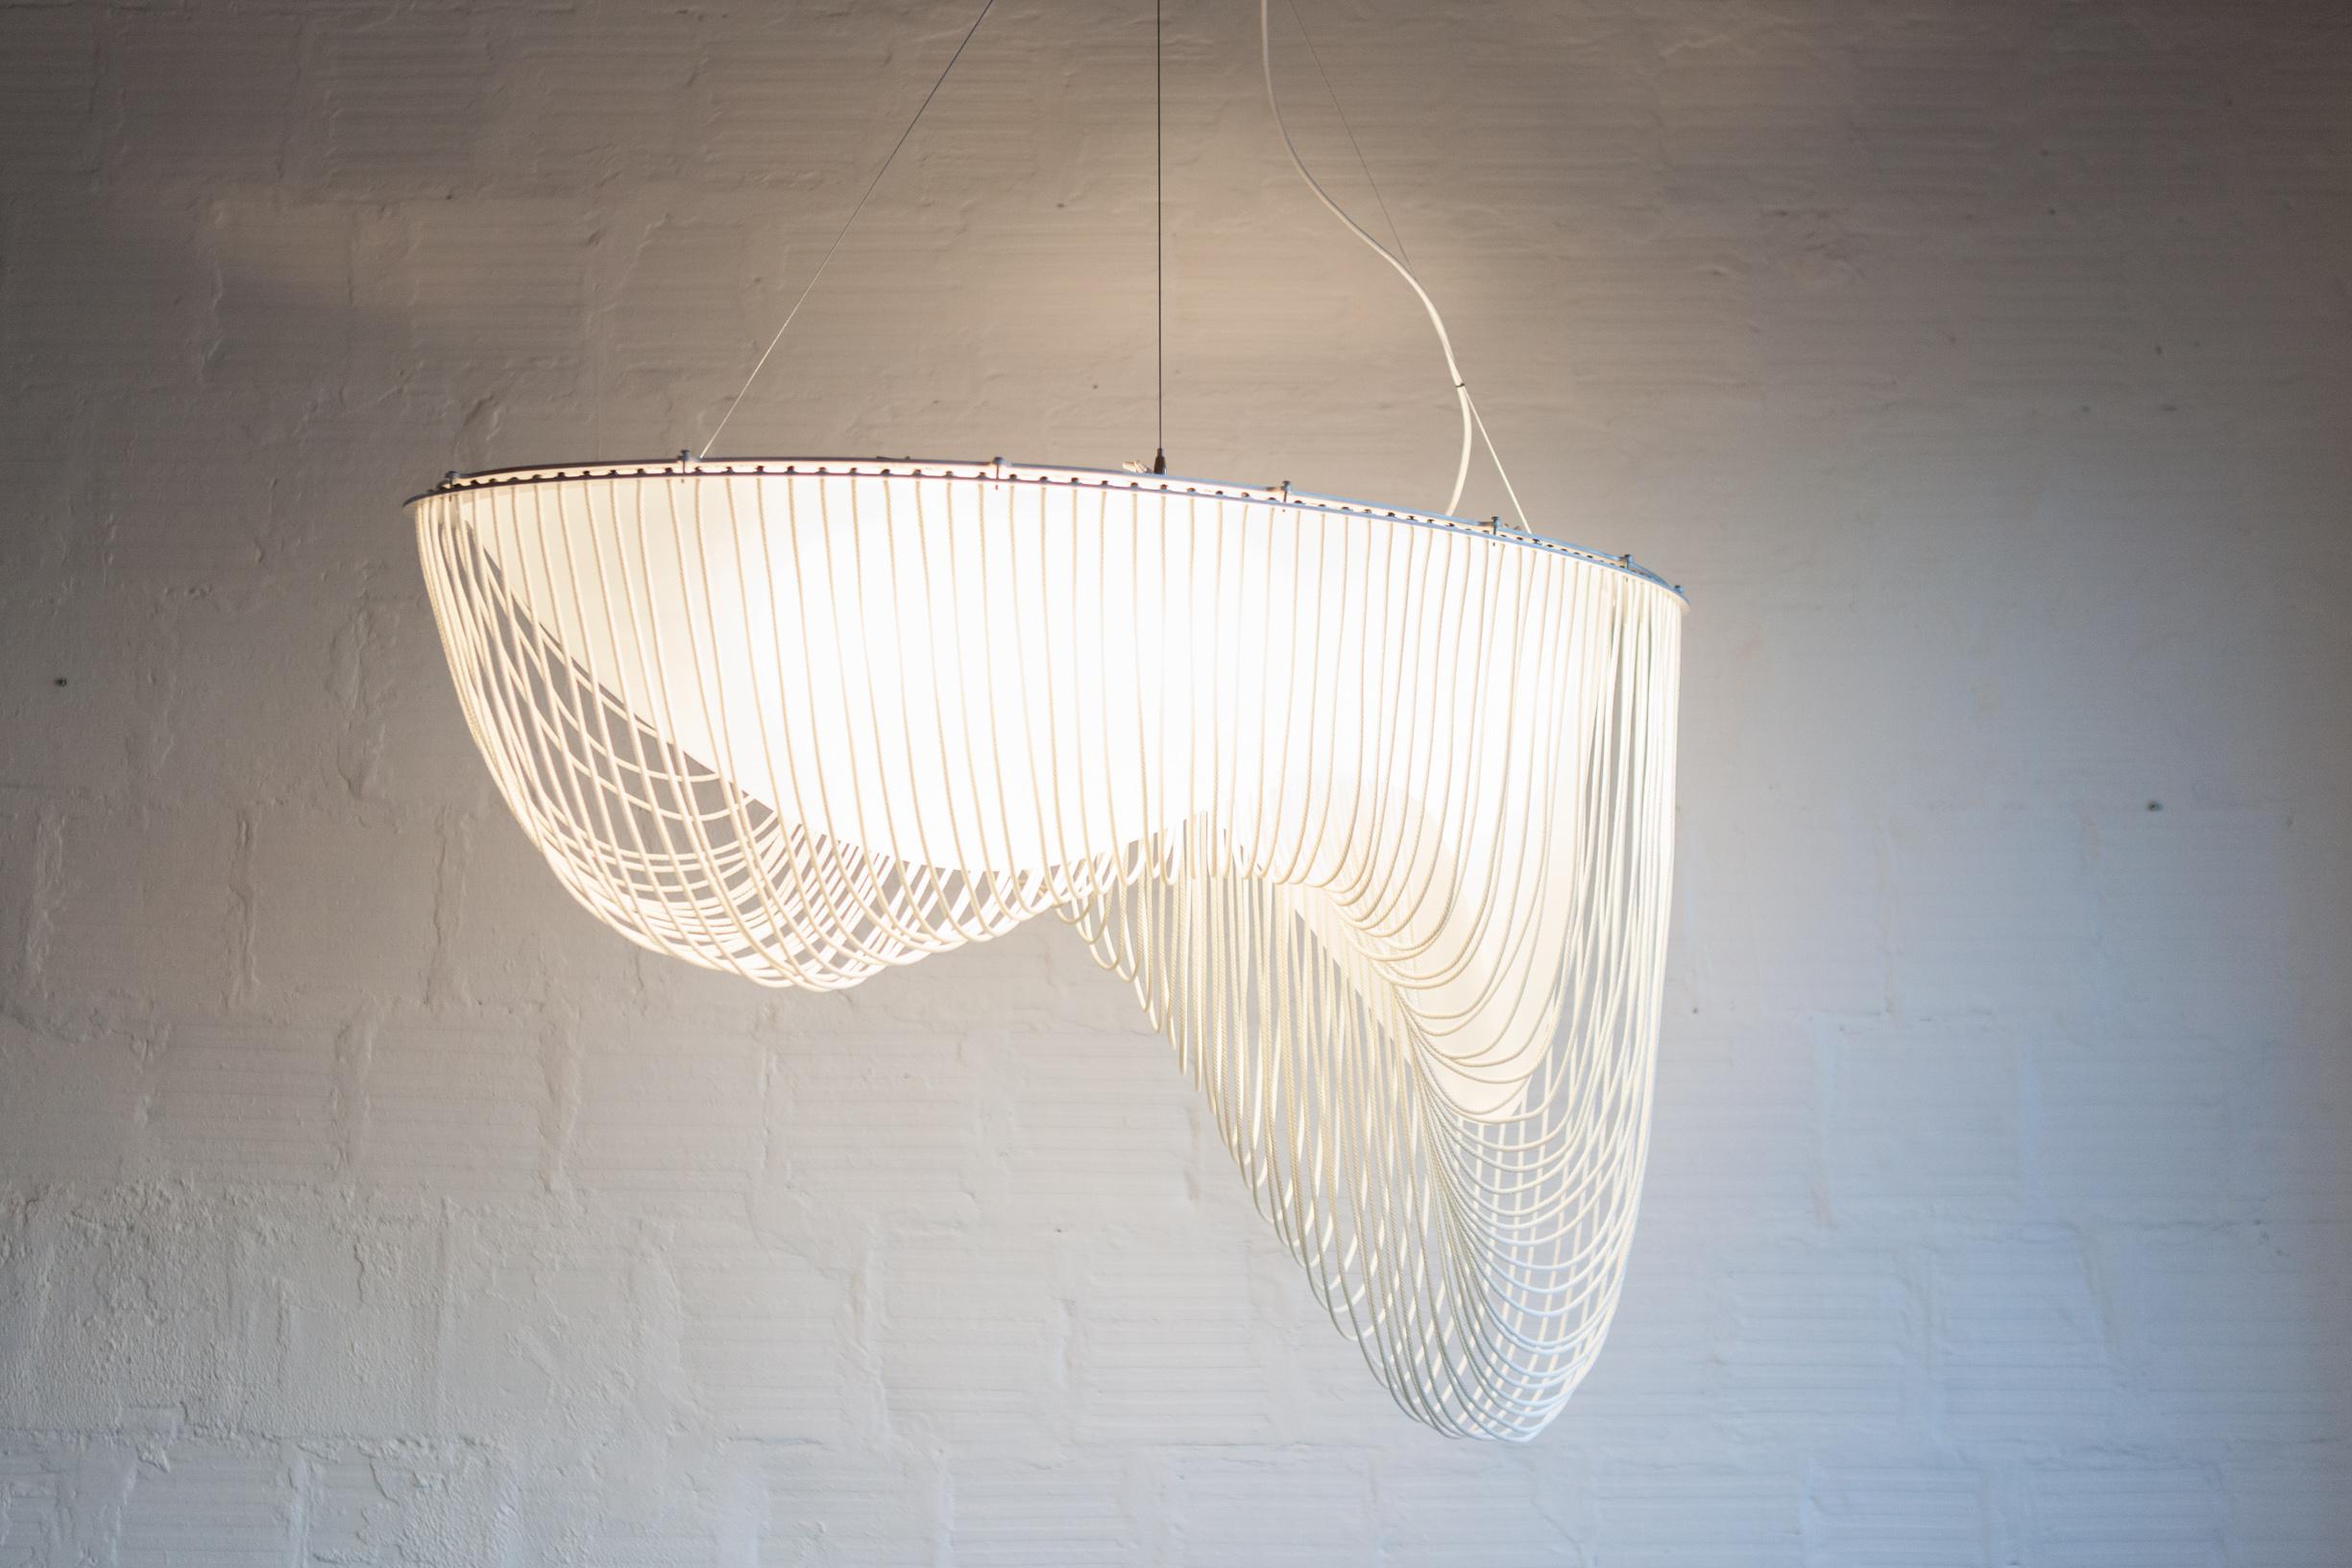 DROOP - LAMP WINNING DESIGN